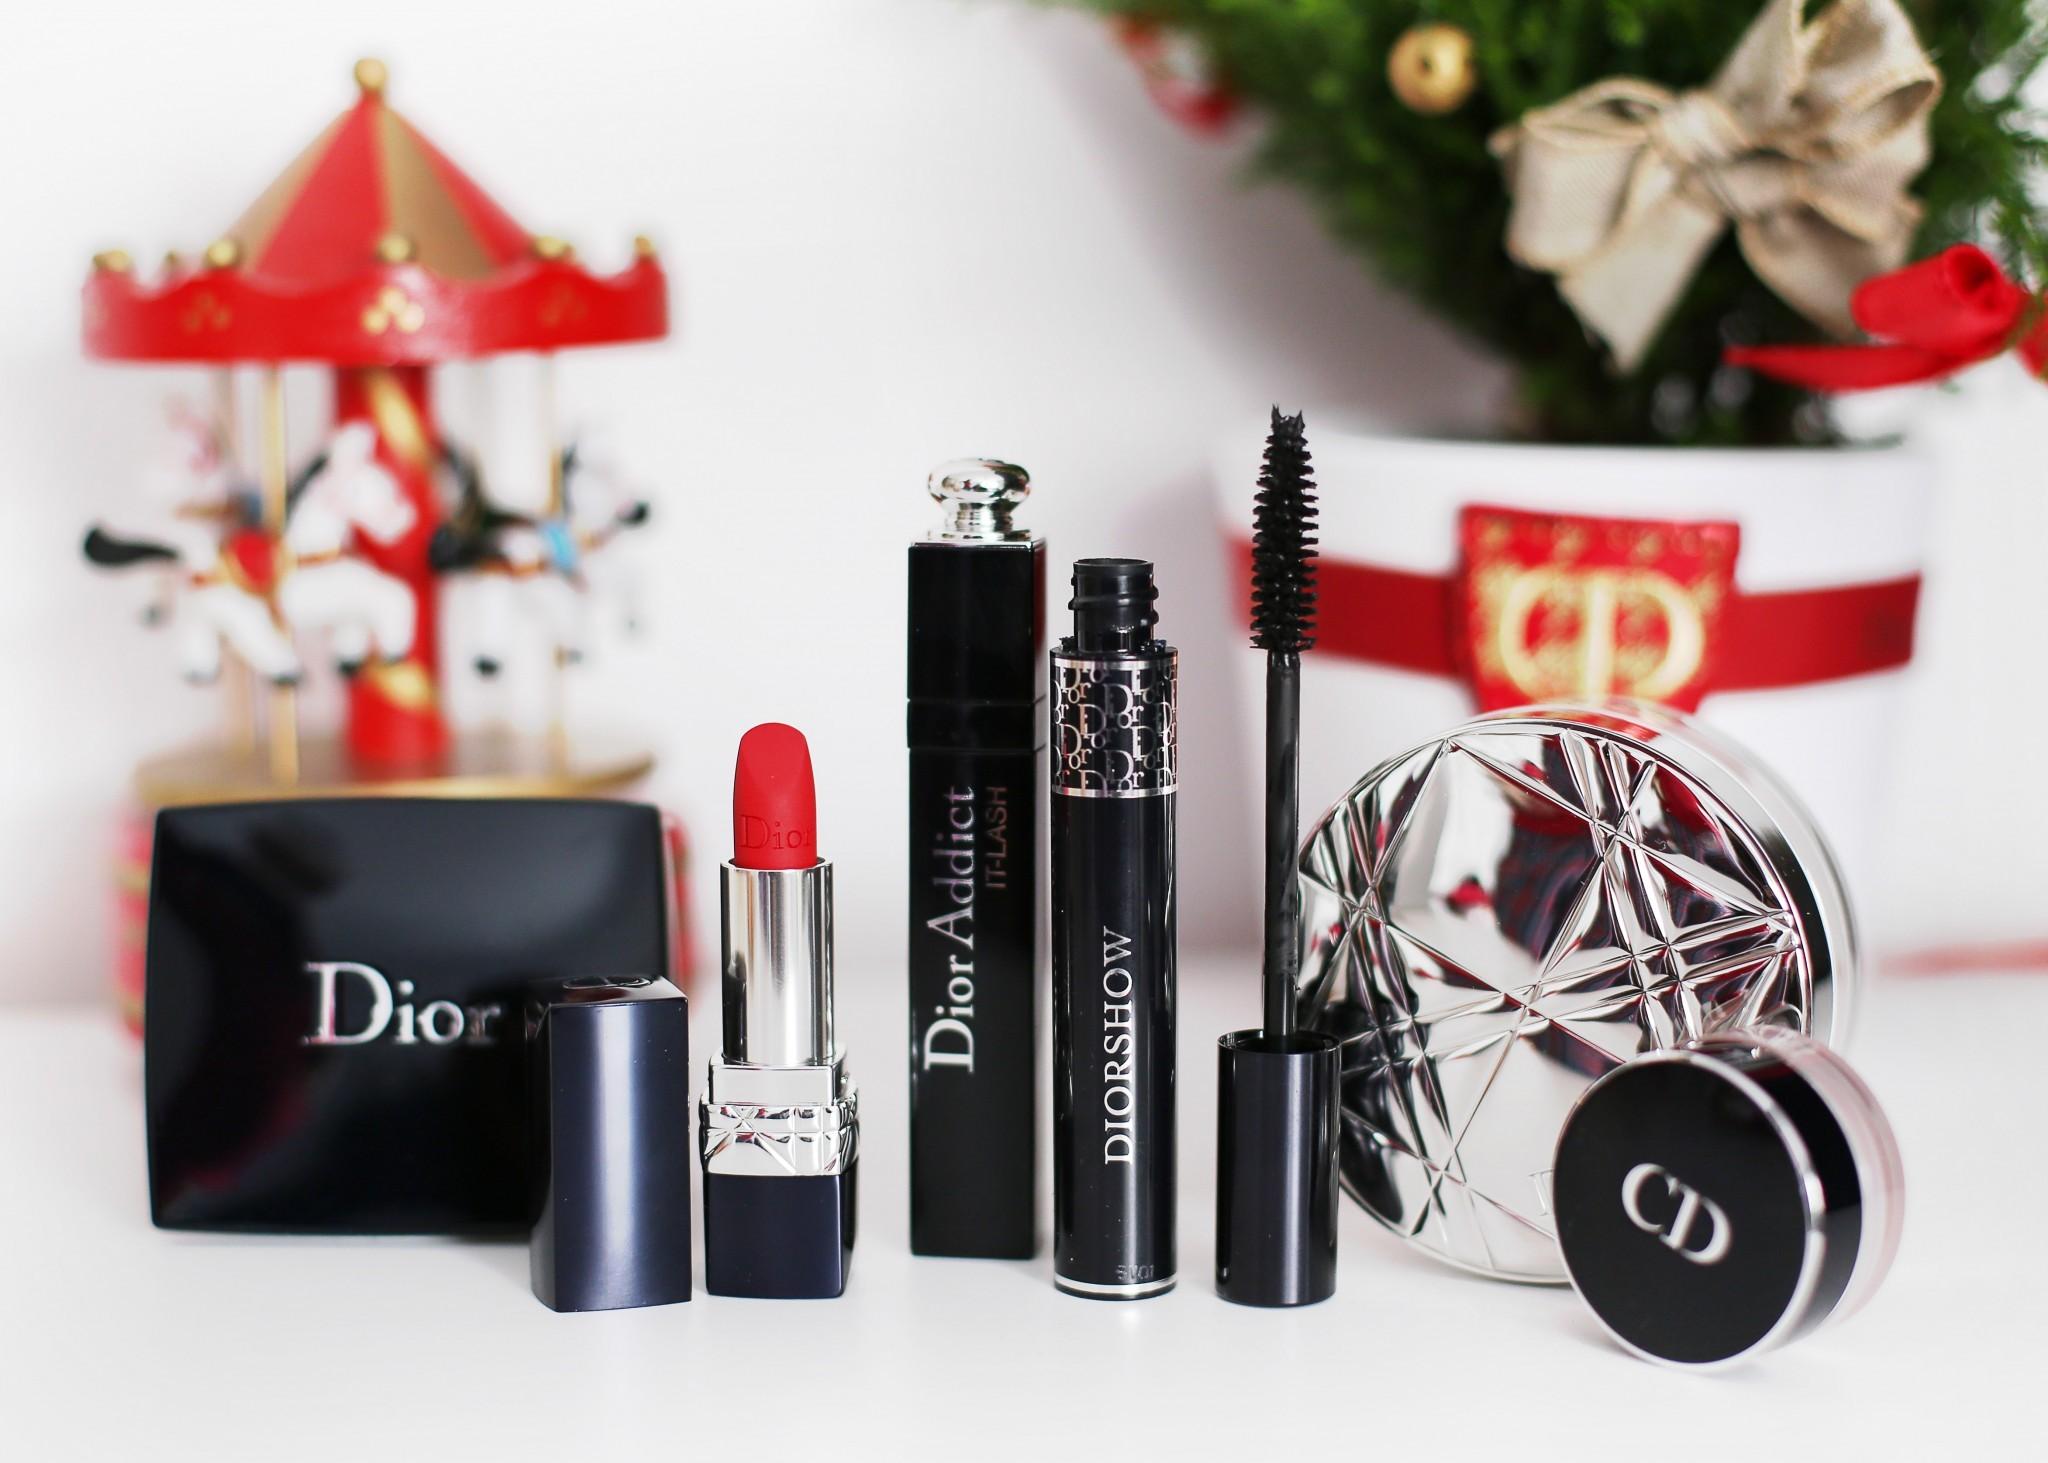 6dior_cadou_craciun_christmas_gifts_fabulous_muses_ideicadpouri